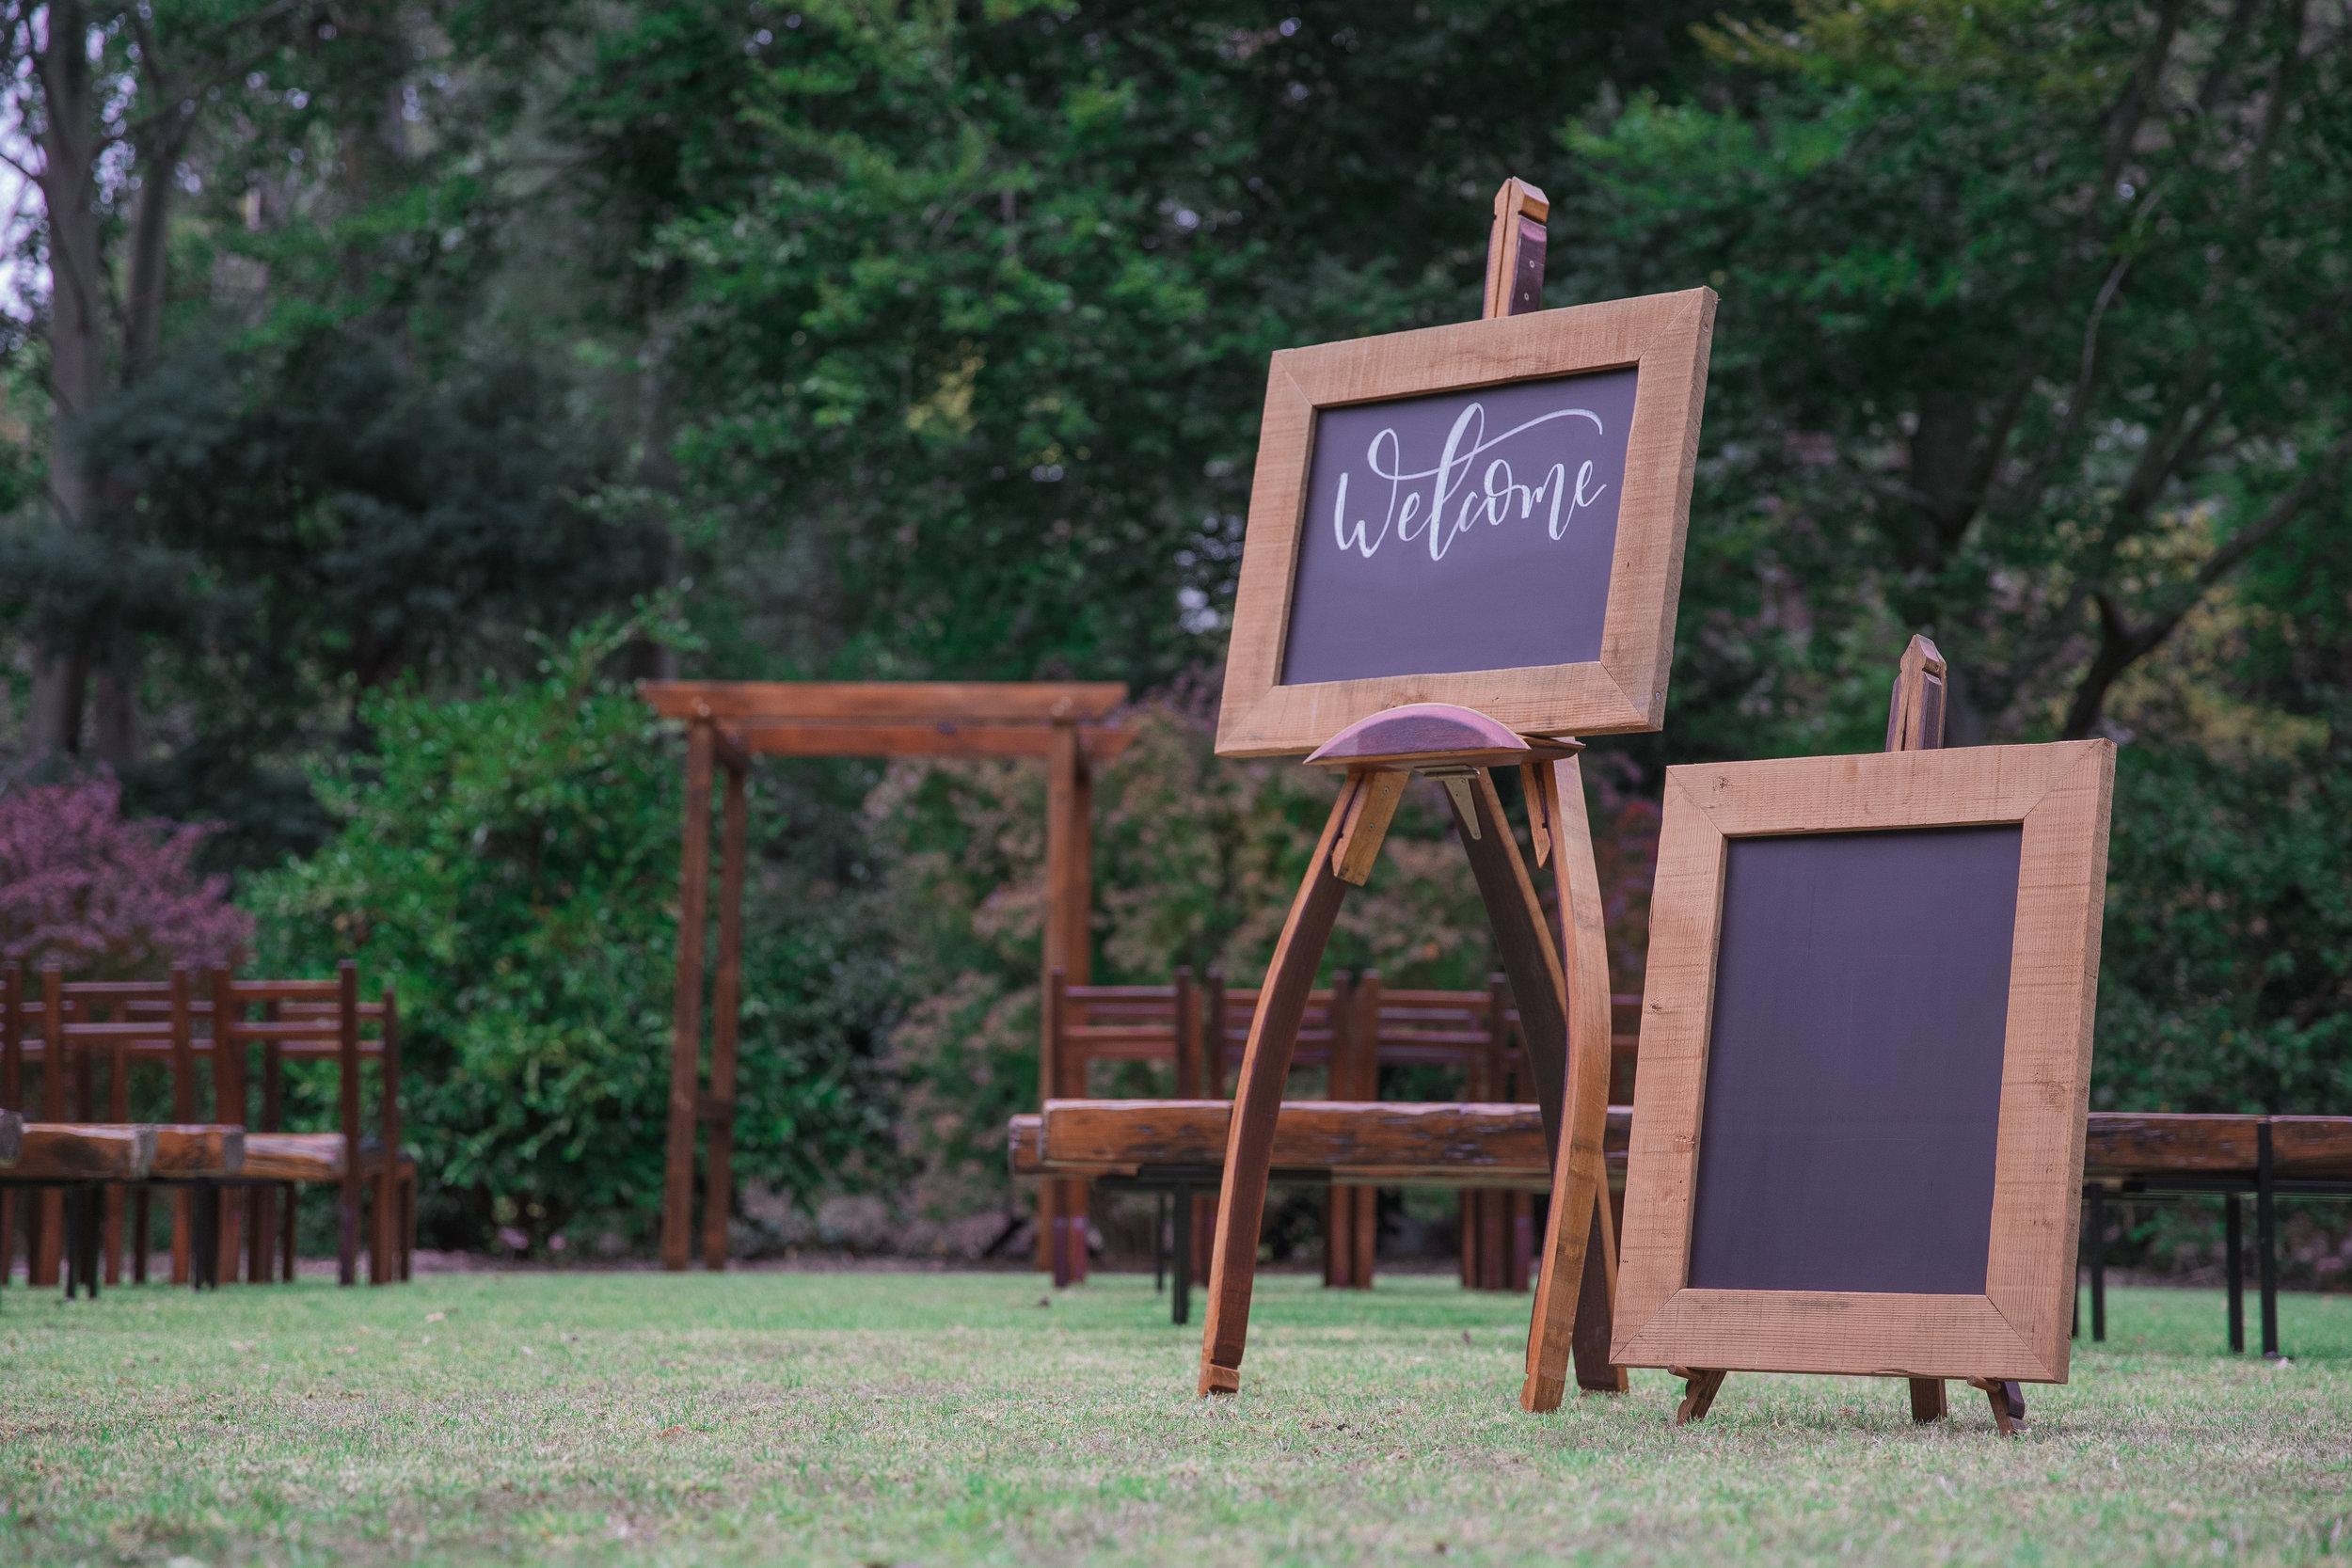 The Rustic Barn reclaimed Oregon chalkboard and wine barrel easels